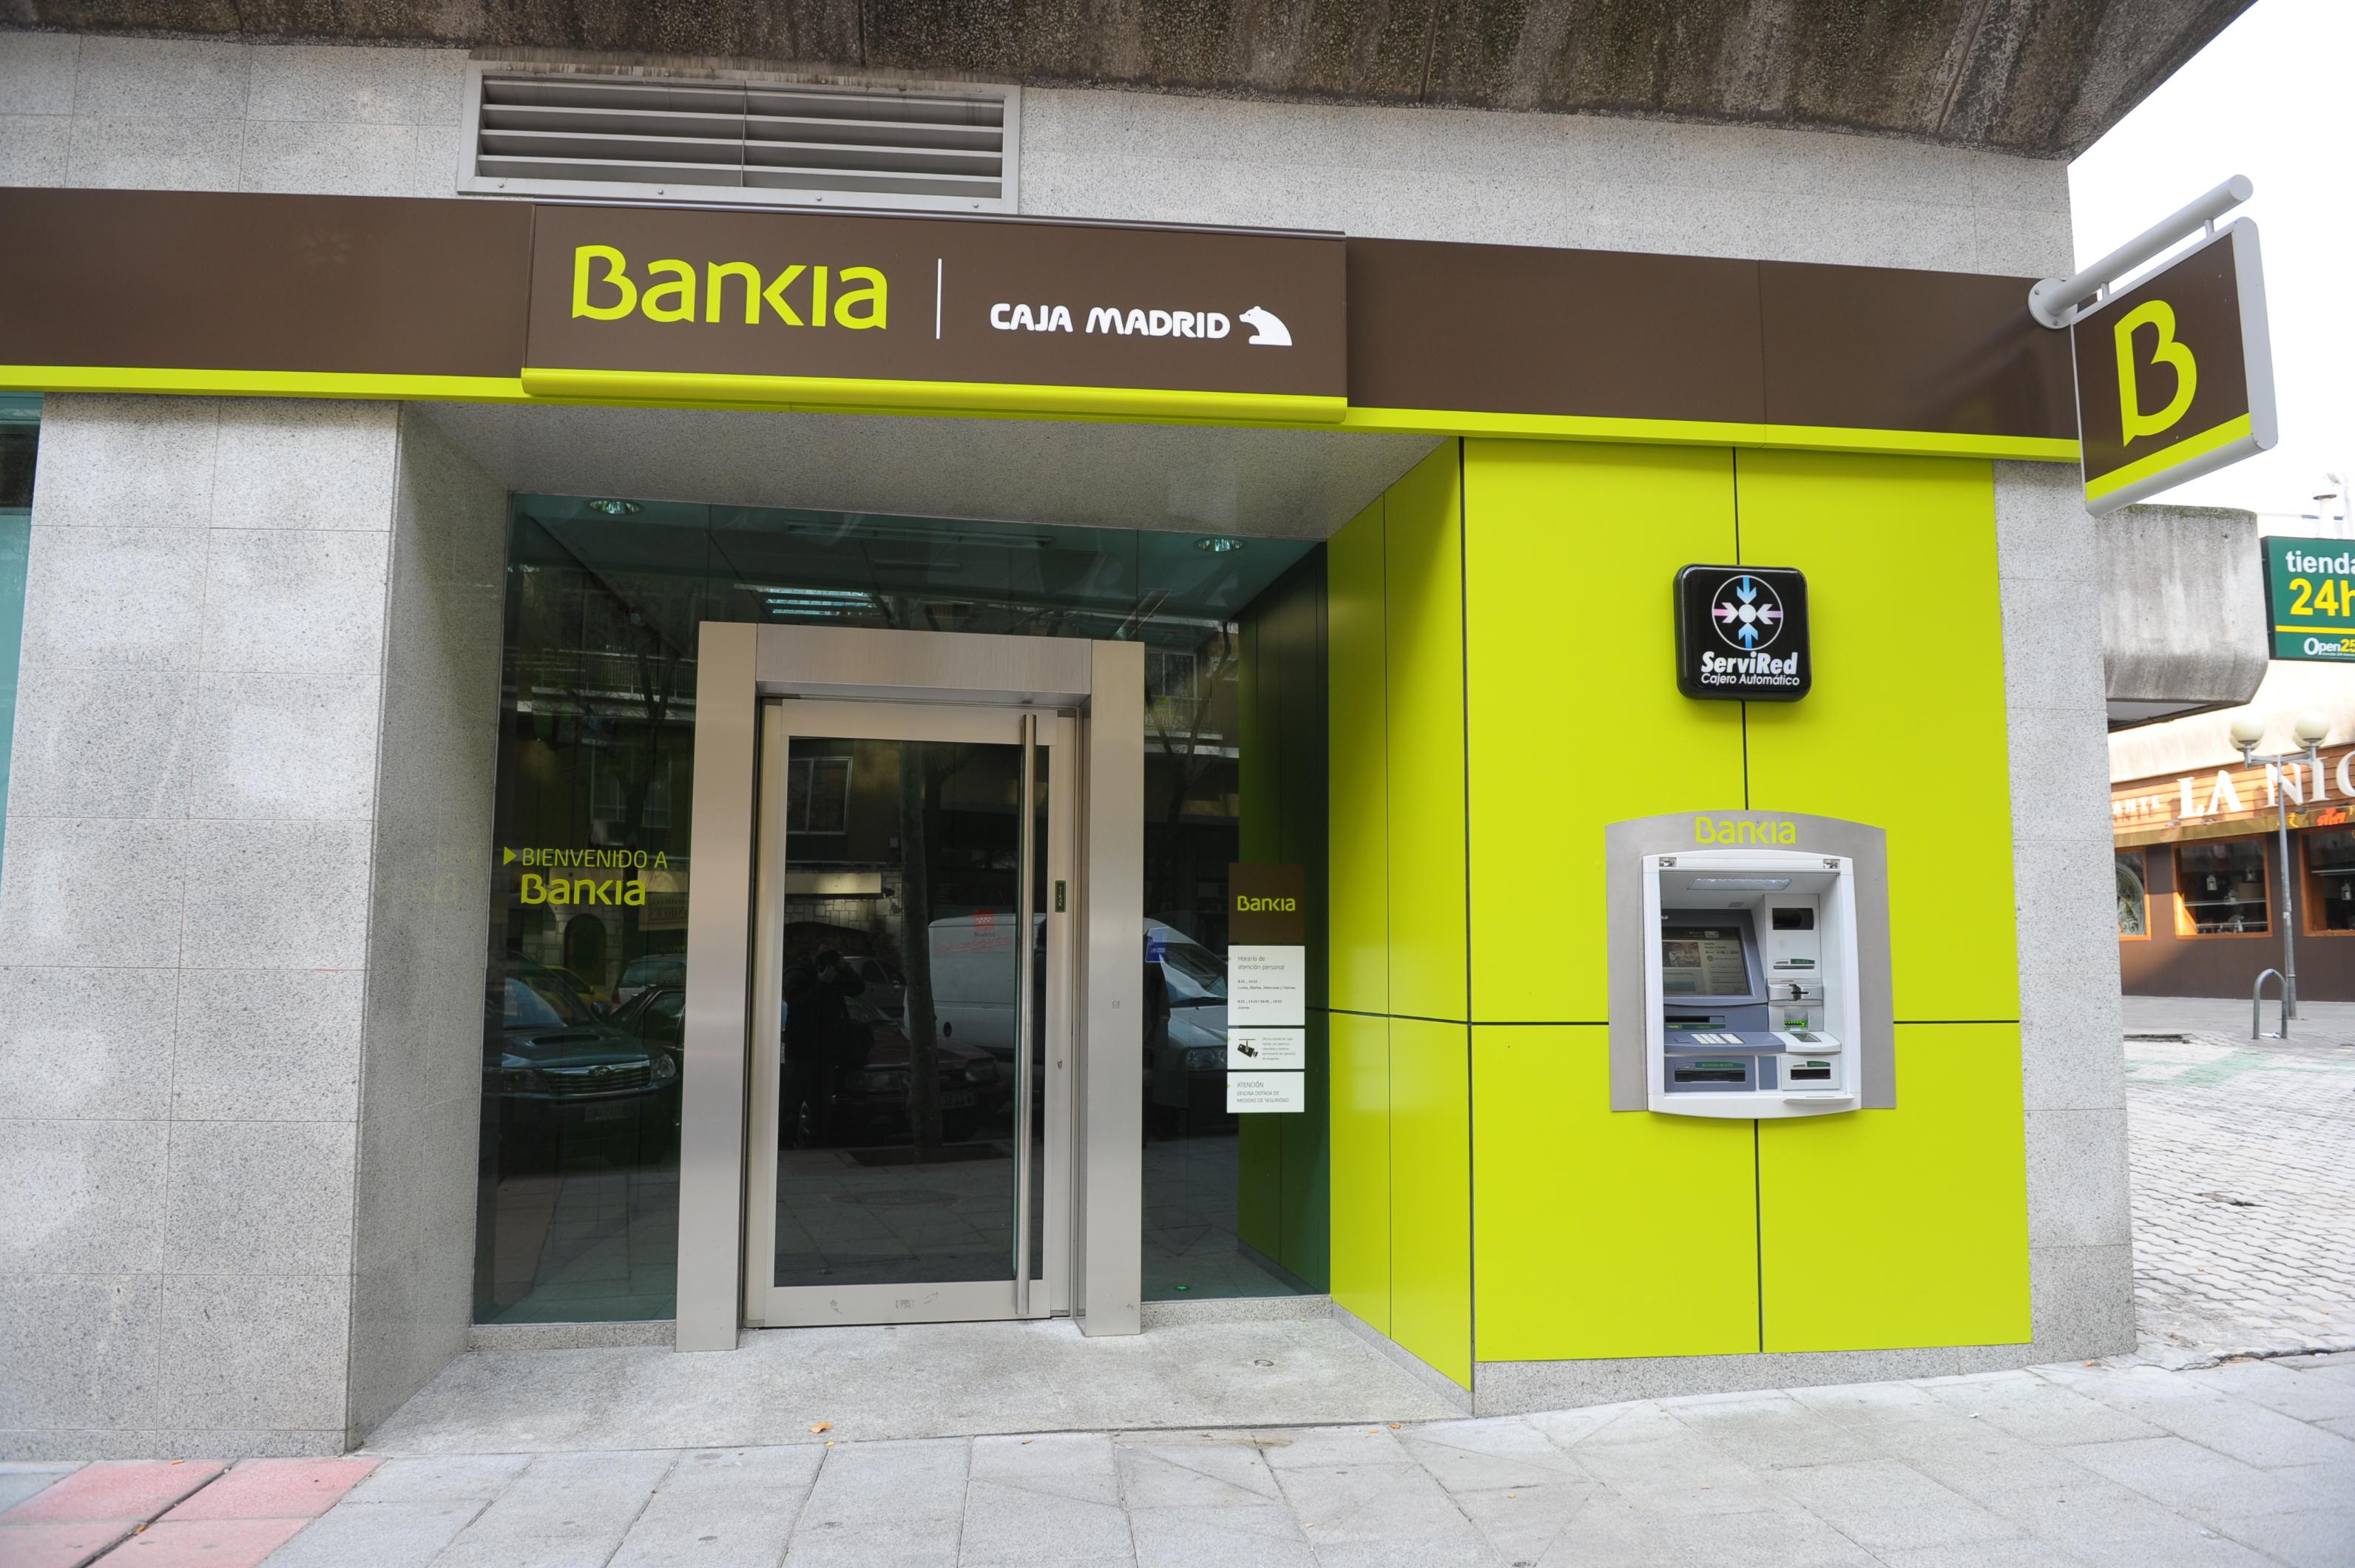 La denuncia de dos majariegas contra bankia majadahonda da for Pisos de bancos bankia